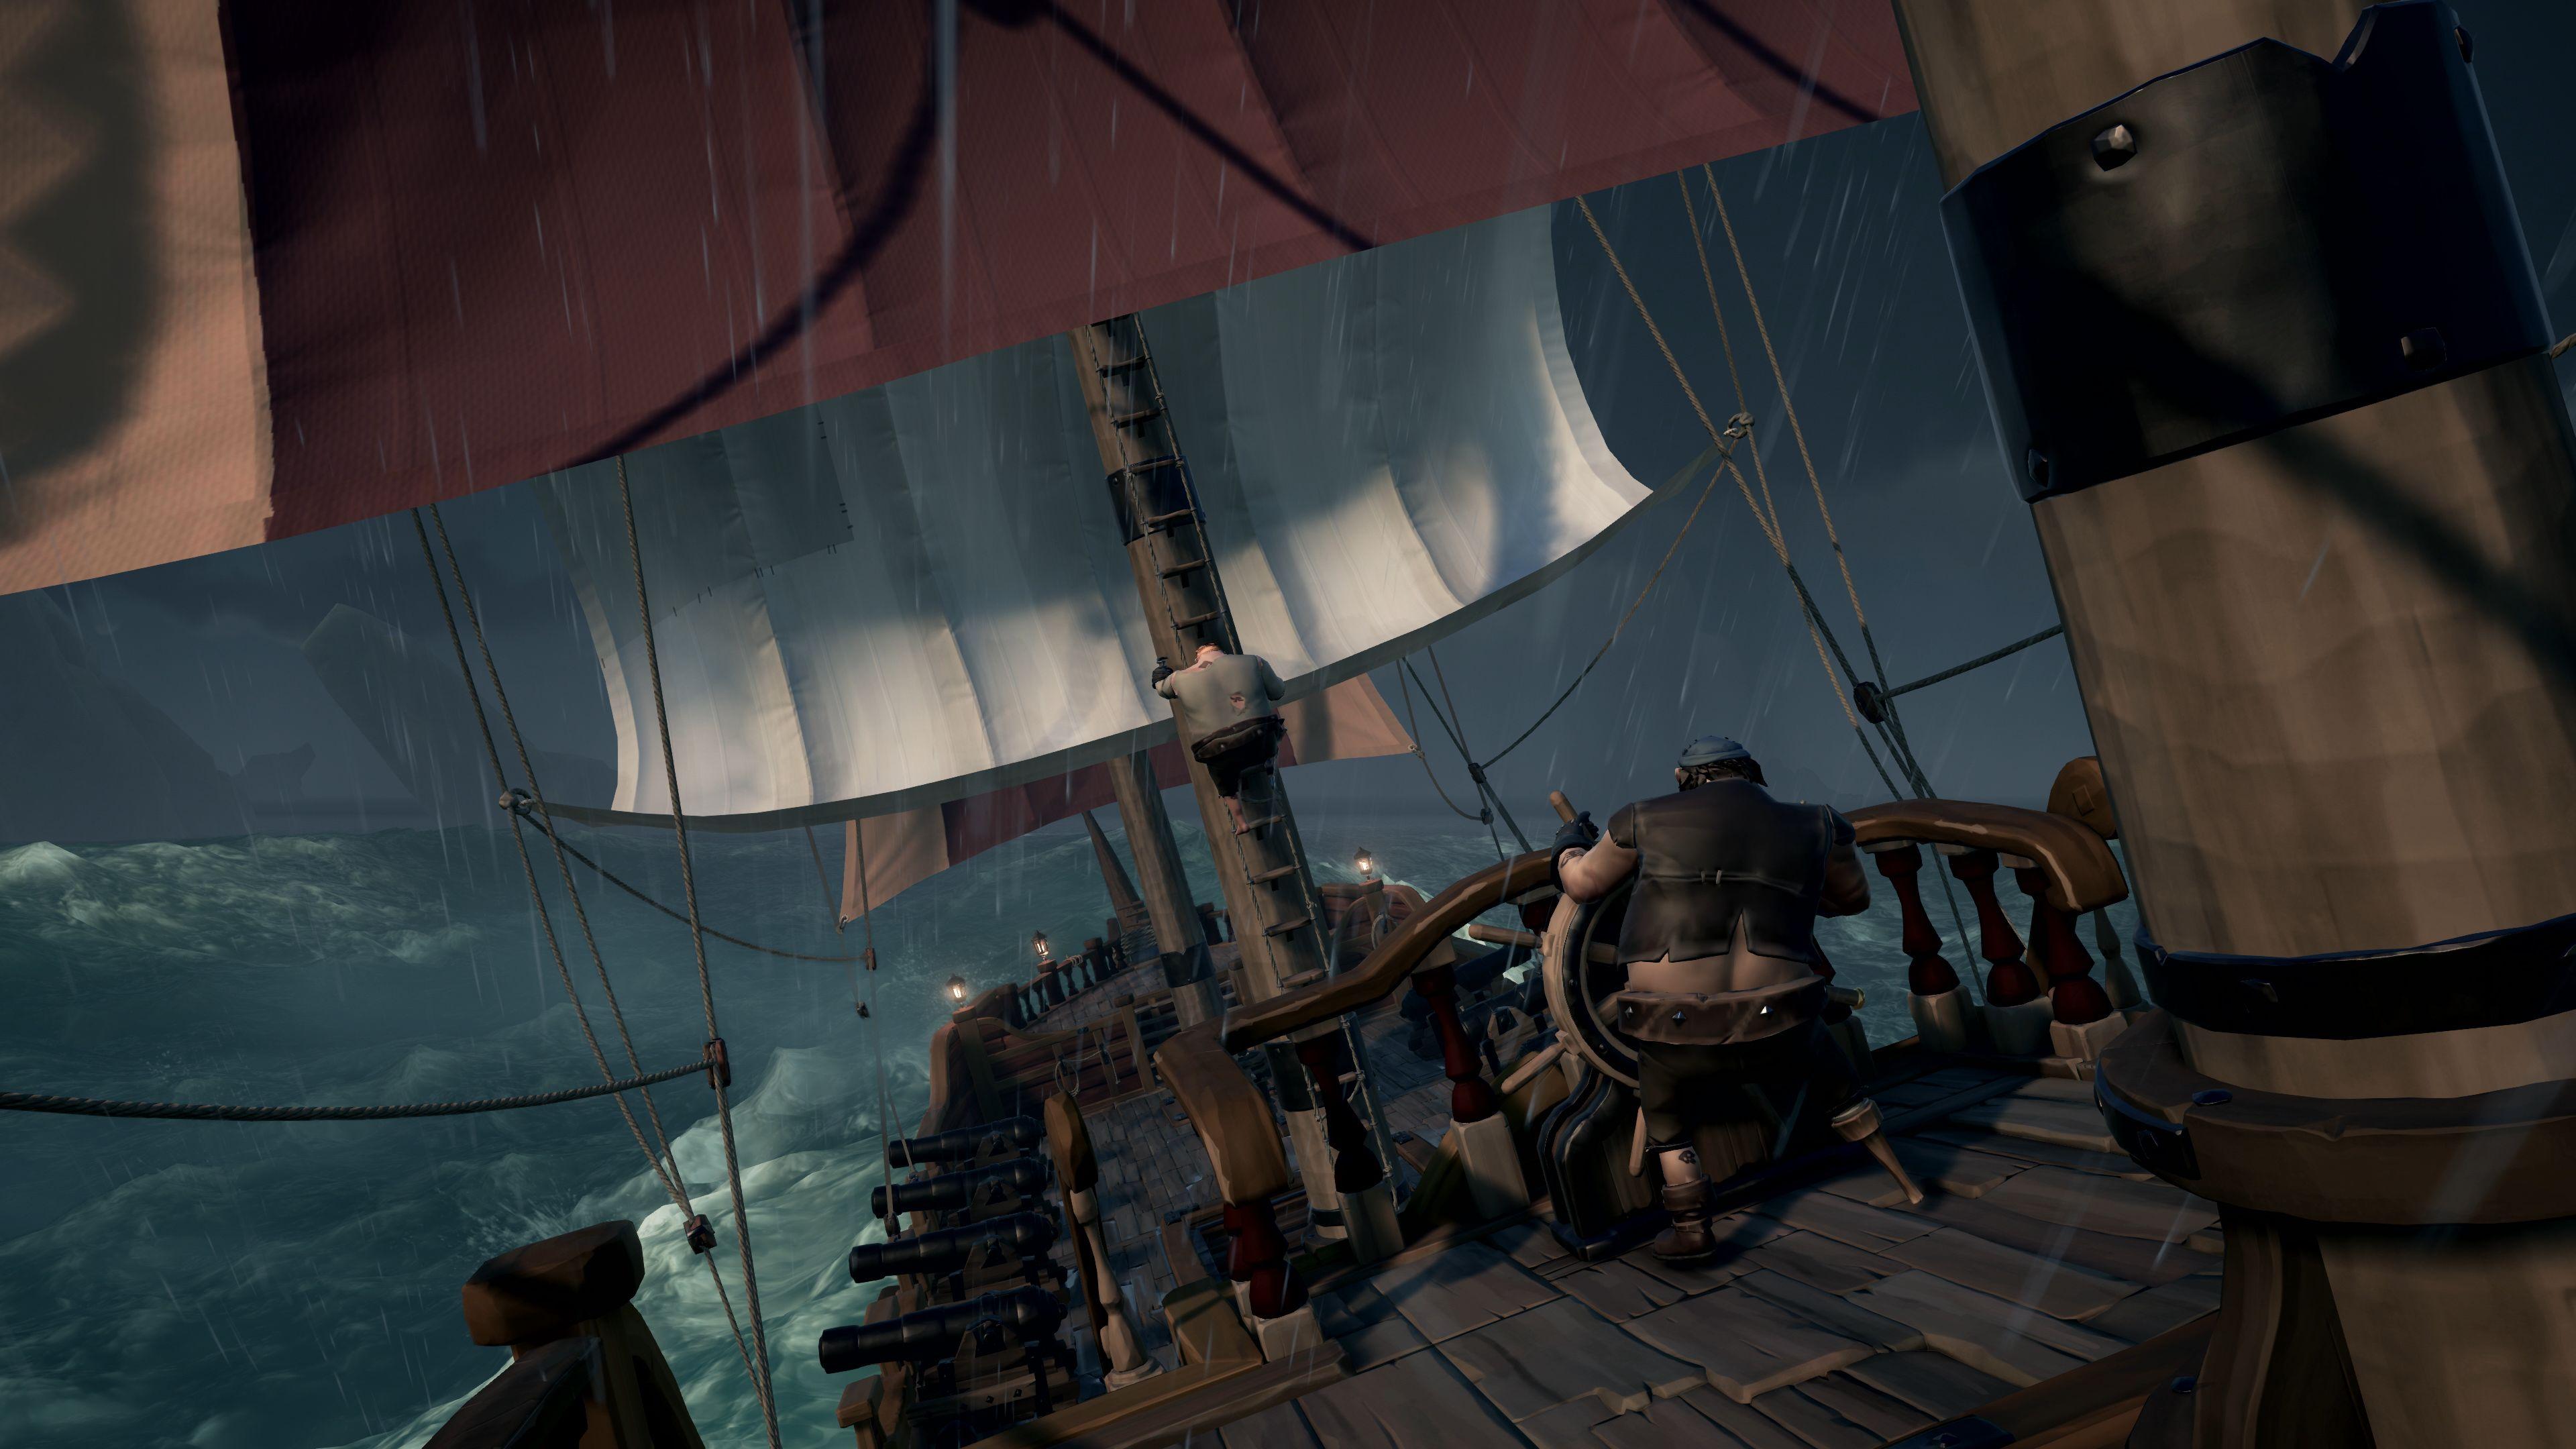 Potvrzen cross-play u Sea of Thieves 148651